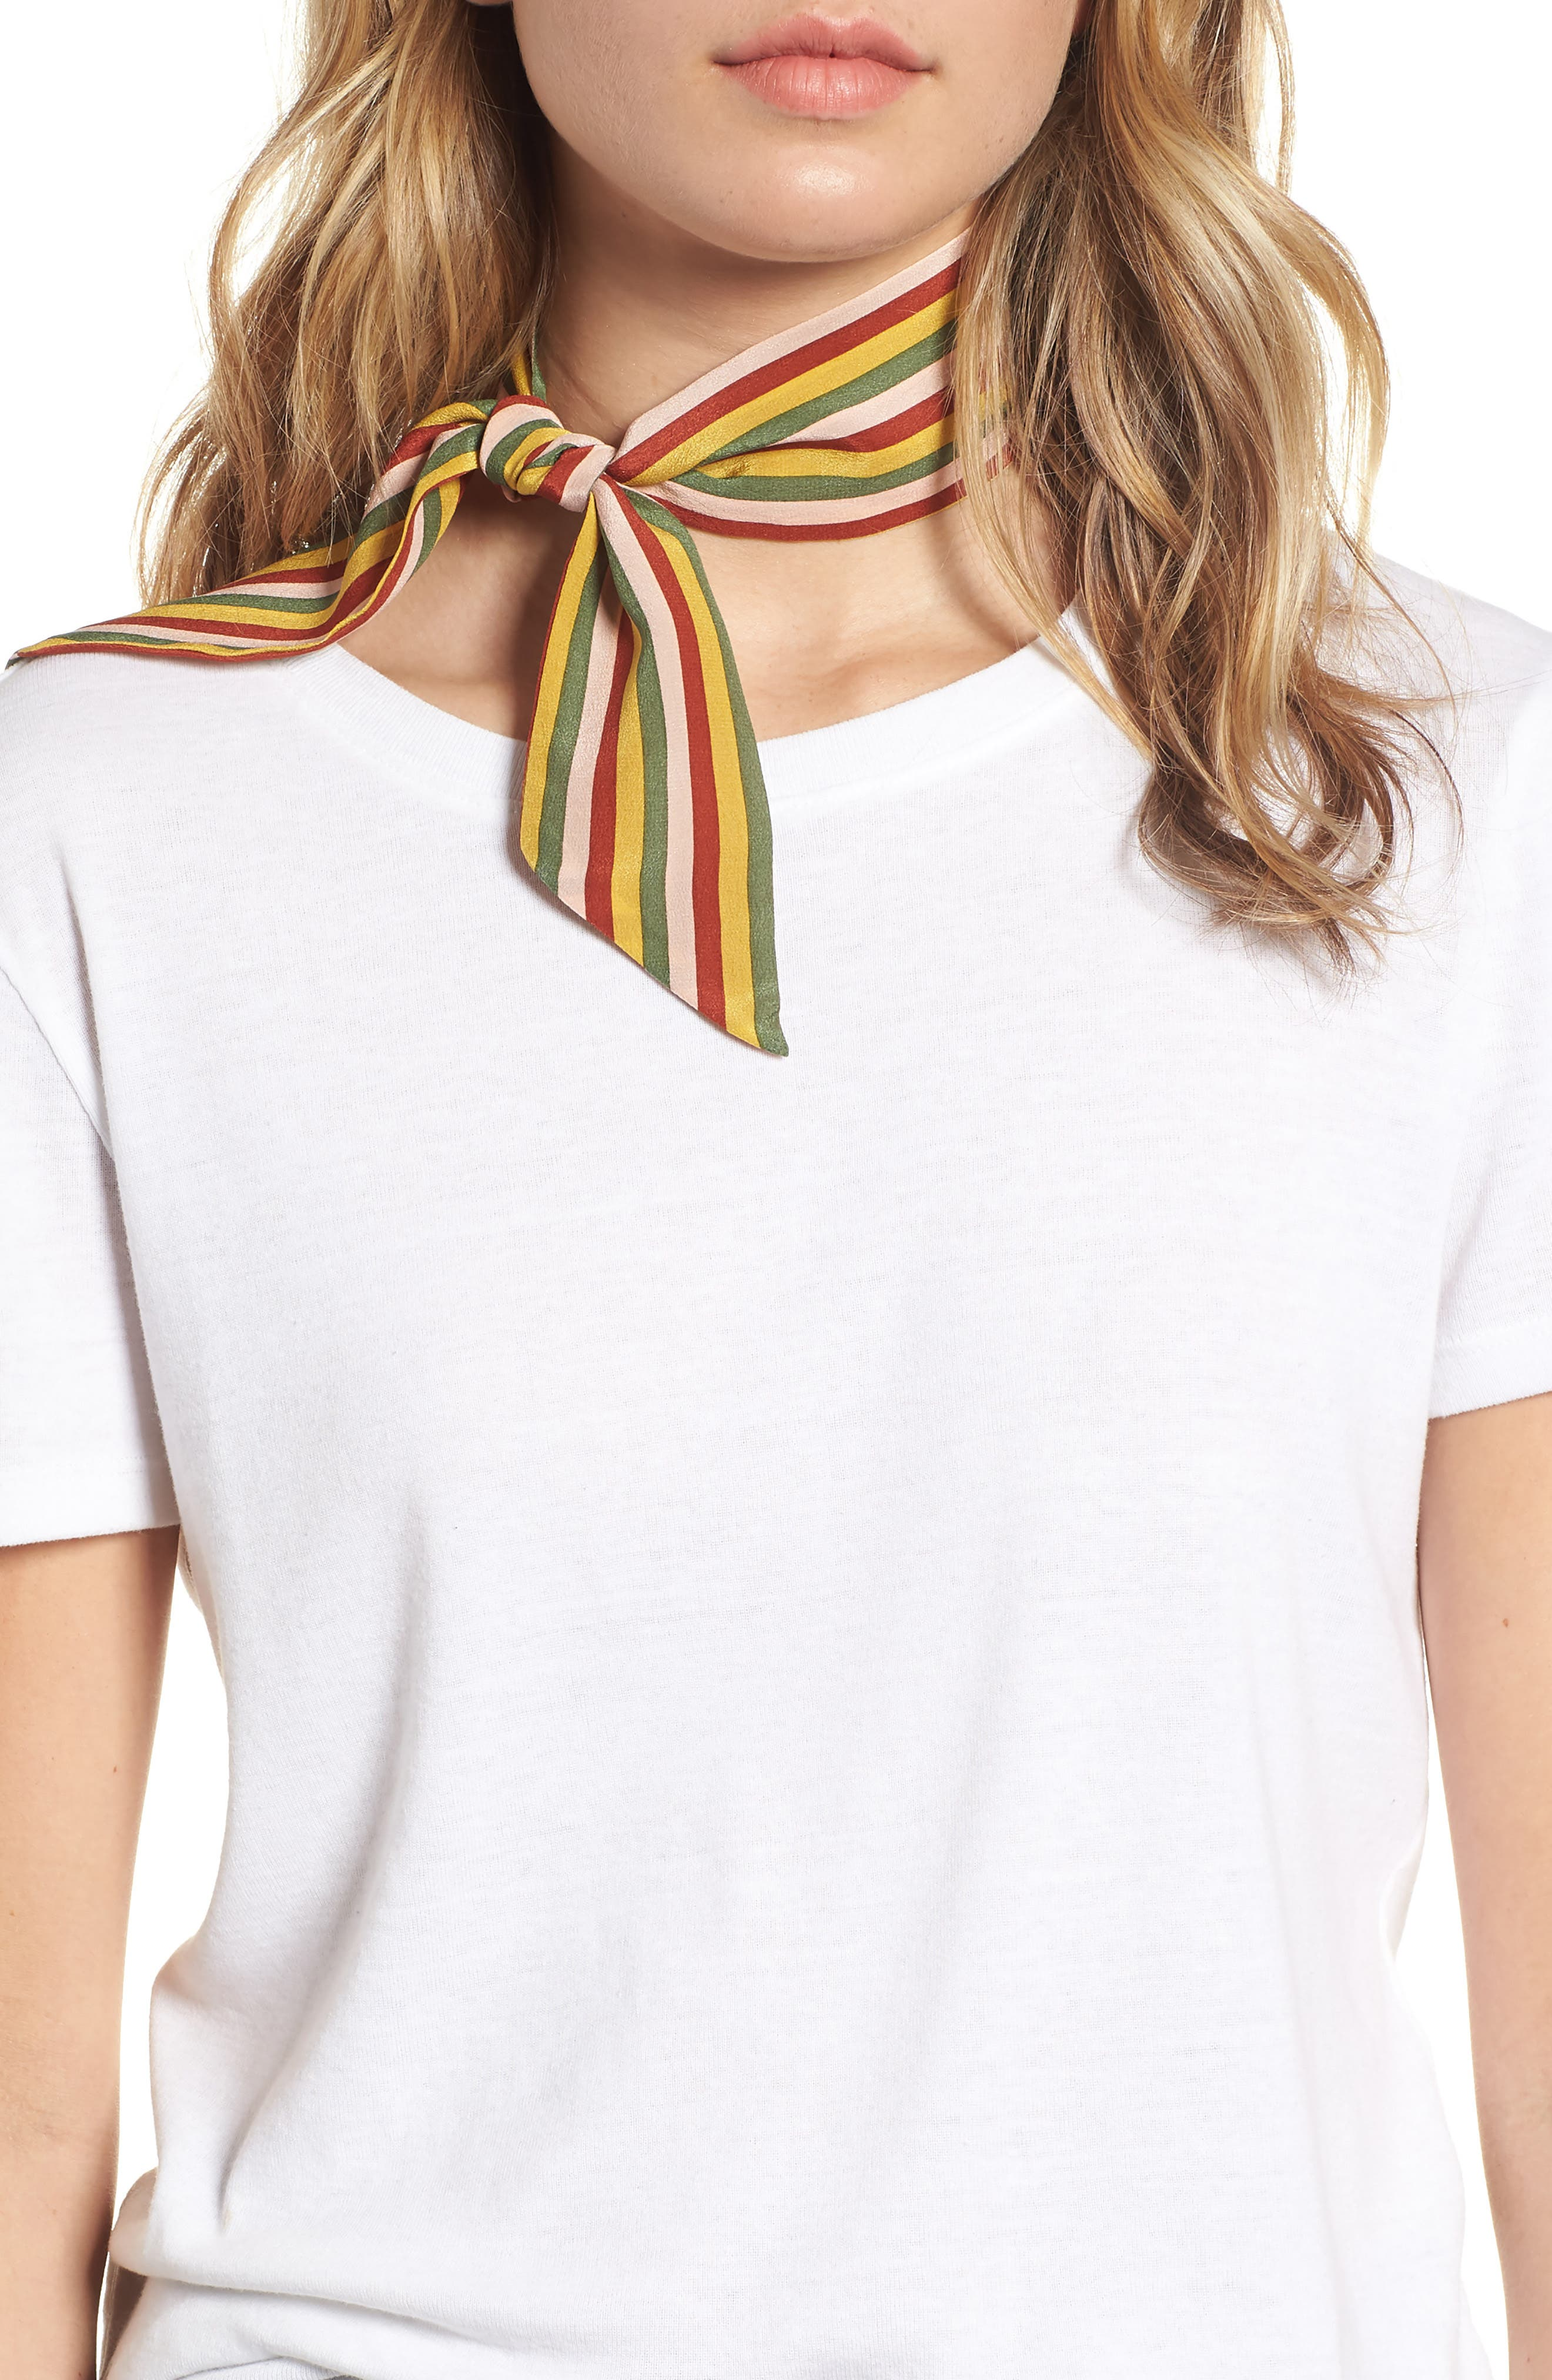 Silk Skinny Bandana,                         Main,                         color, 300